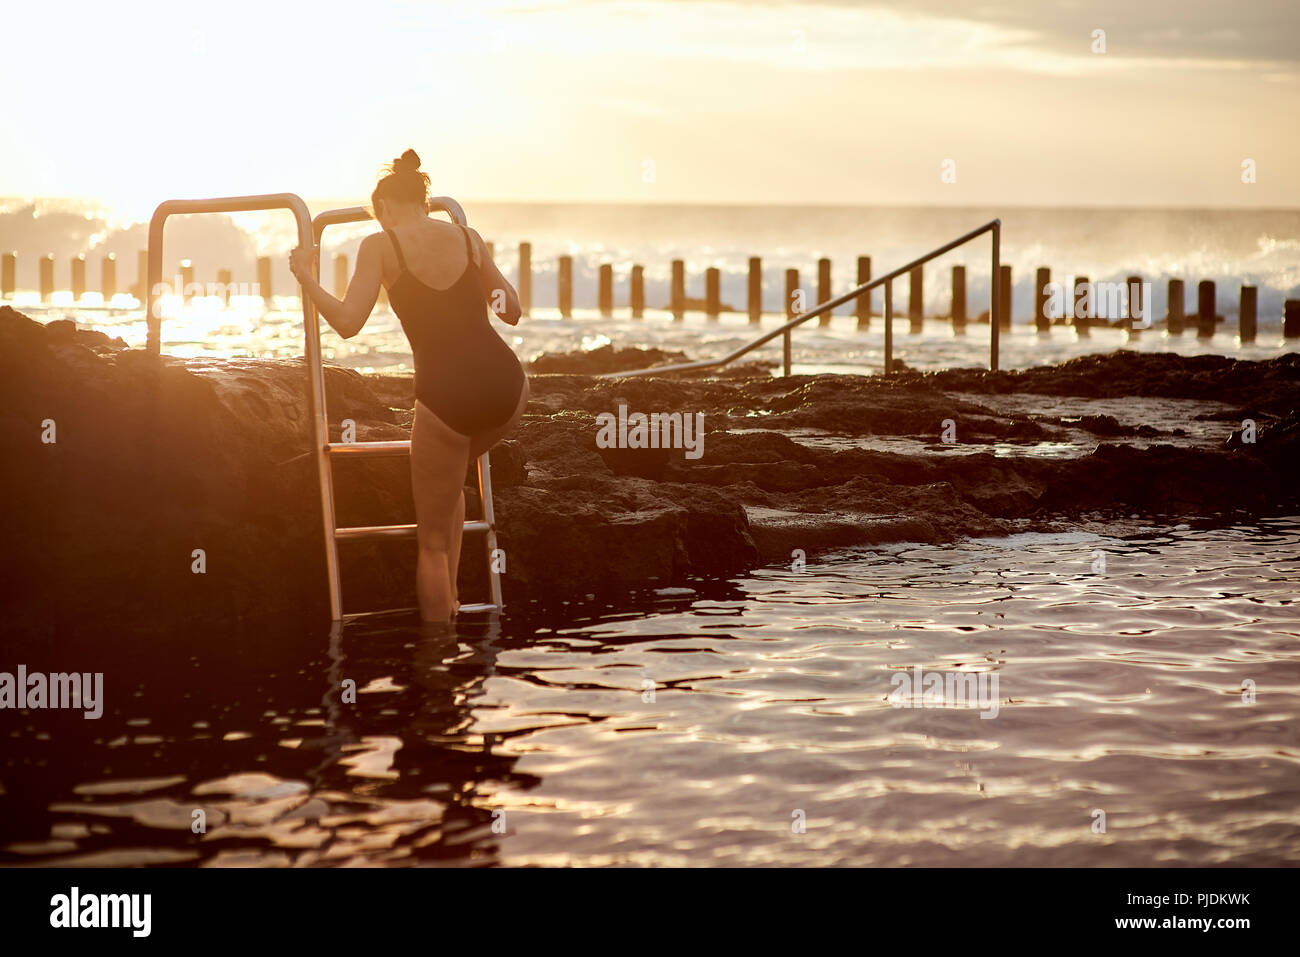 Woman climbing up coastal pool ladder, Las Palmas, Gran Canaria, Canary Islands, Spain - Stock Image